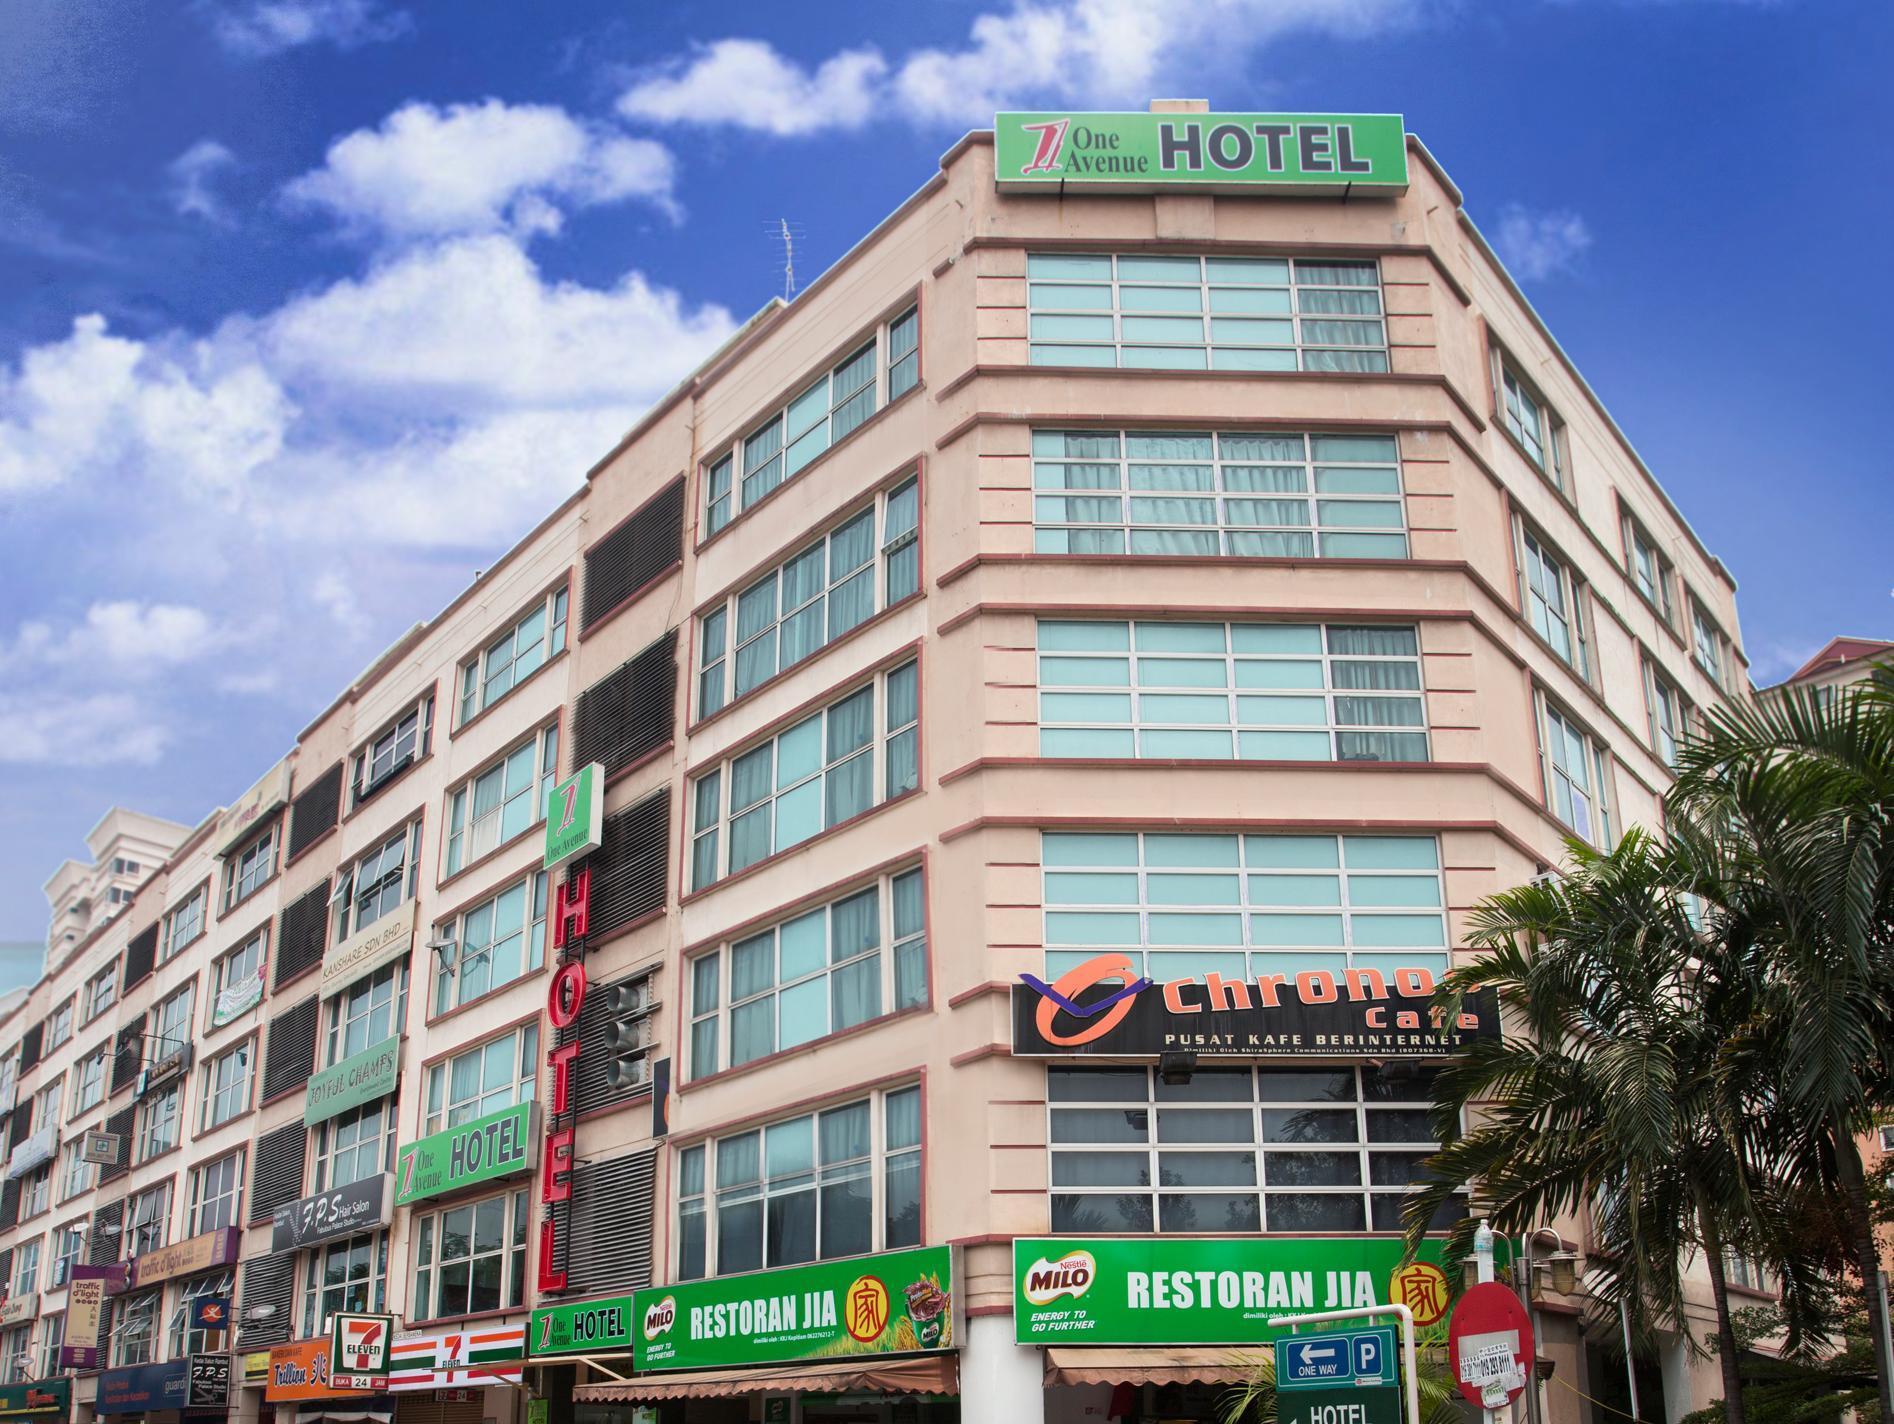 One Avenue Hotel, Kuala Lumpur